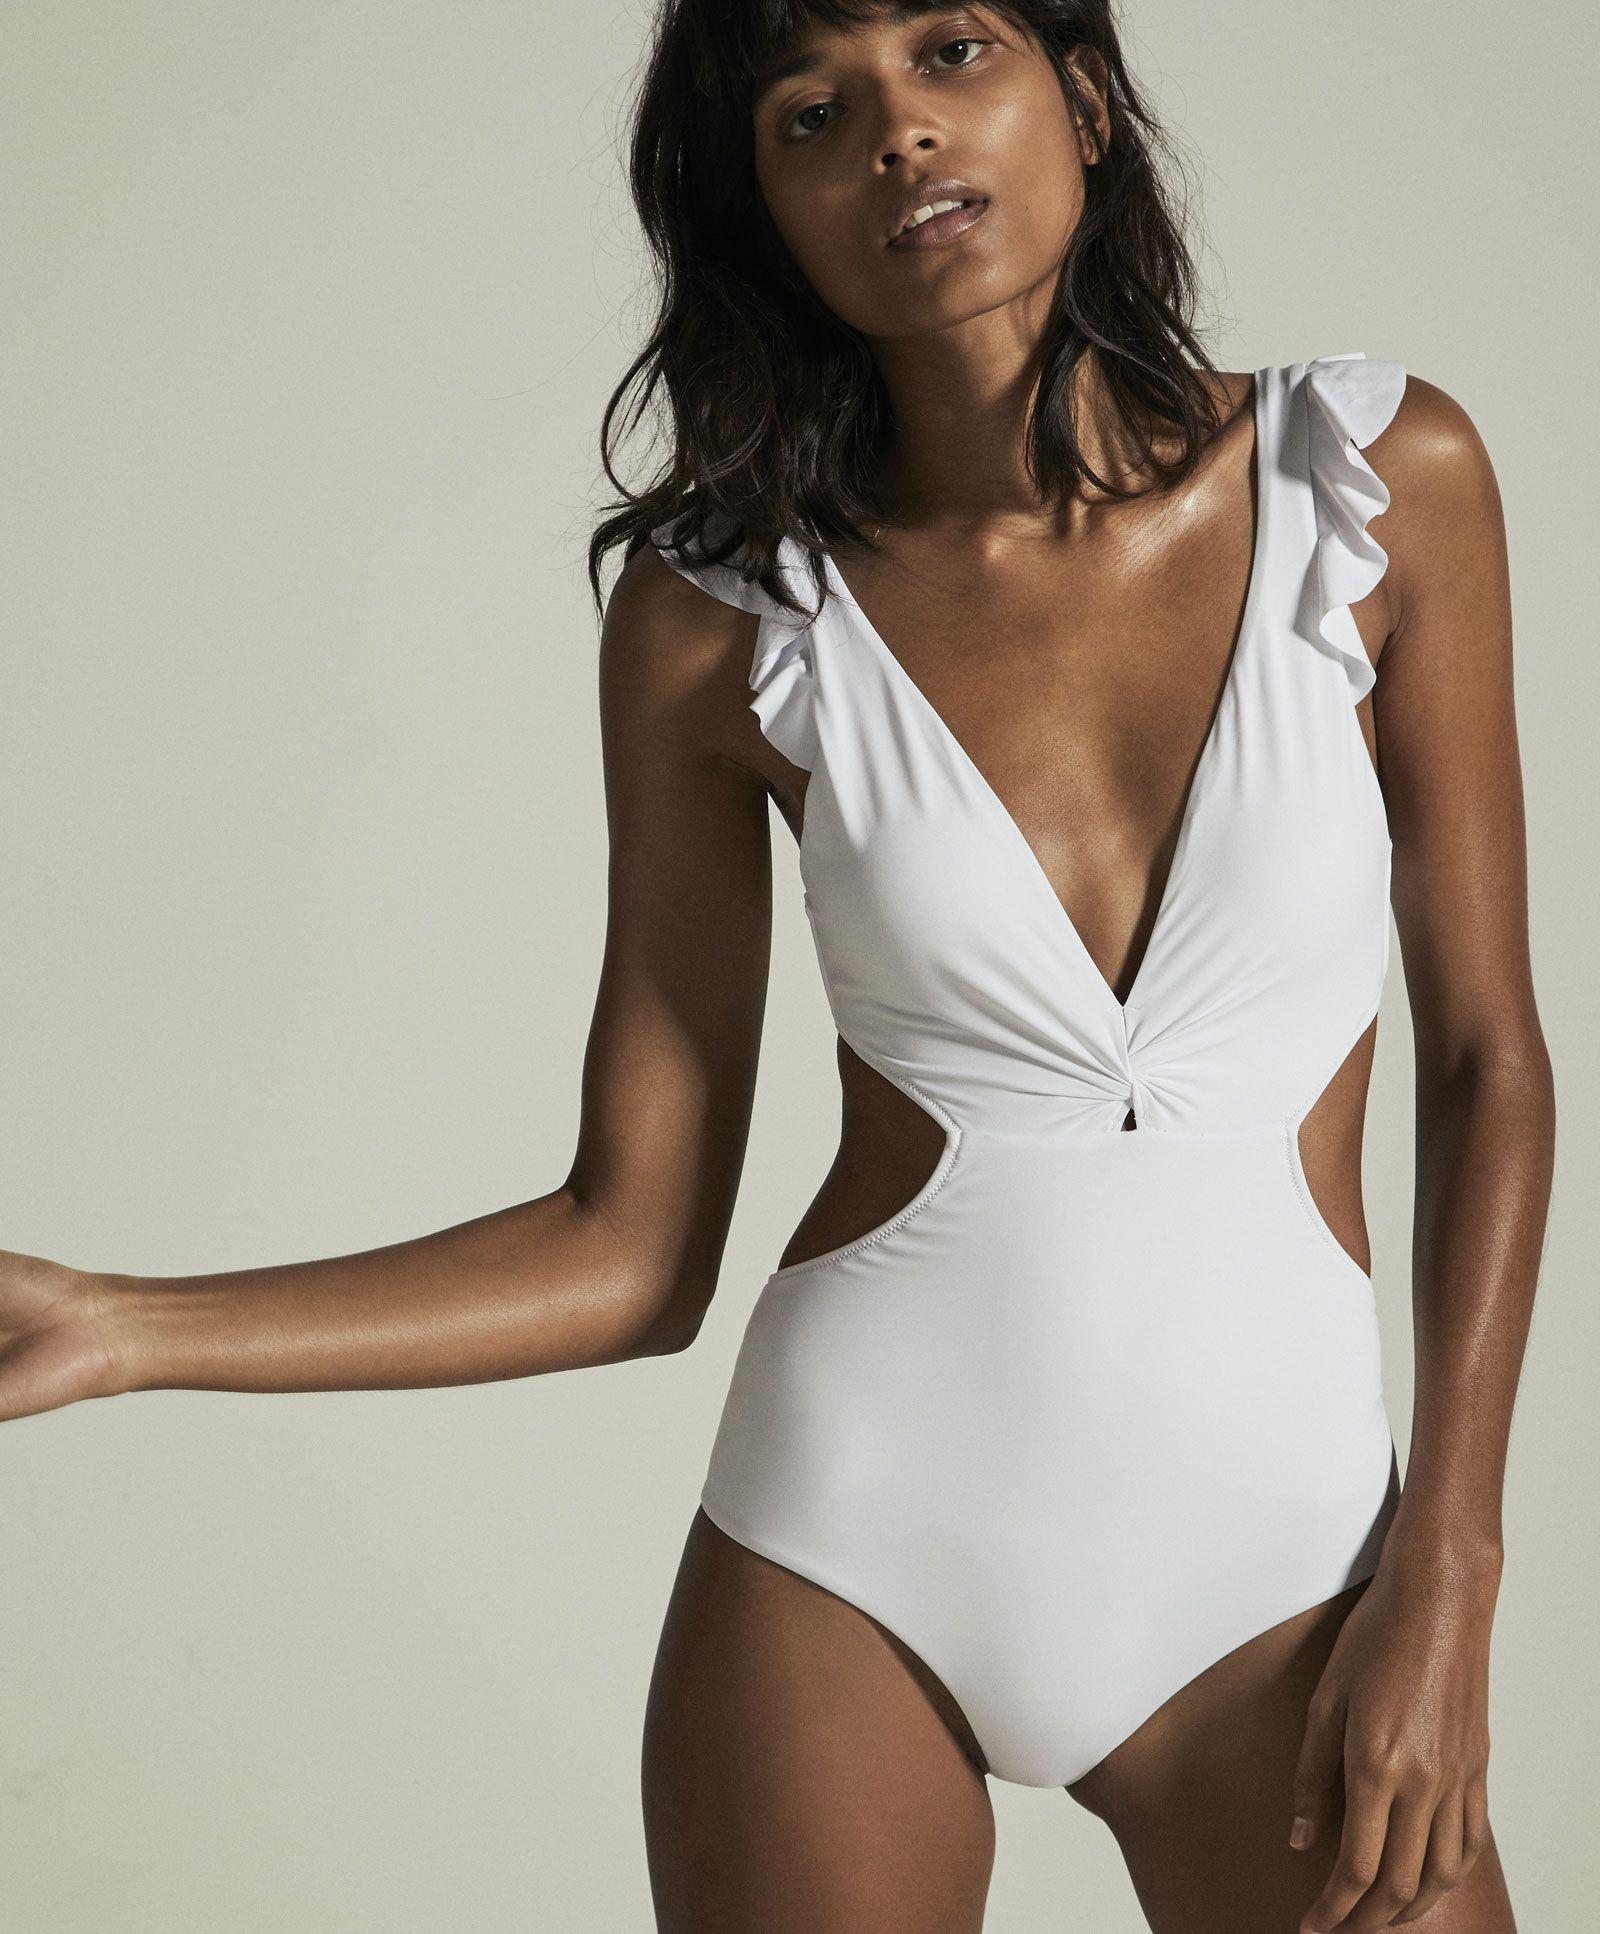 Trikini Volantes Blanco Vistiendo De Playa Alta Moda Ropa De Bano